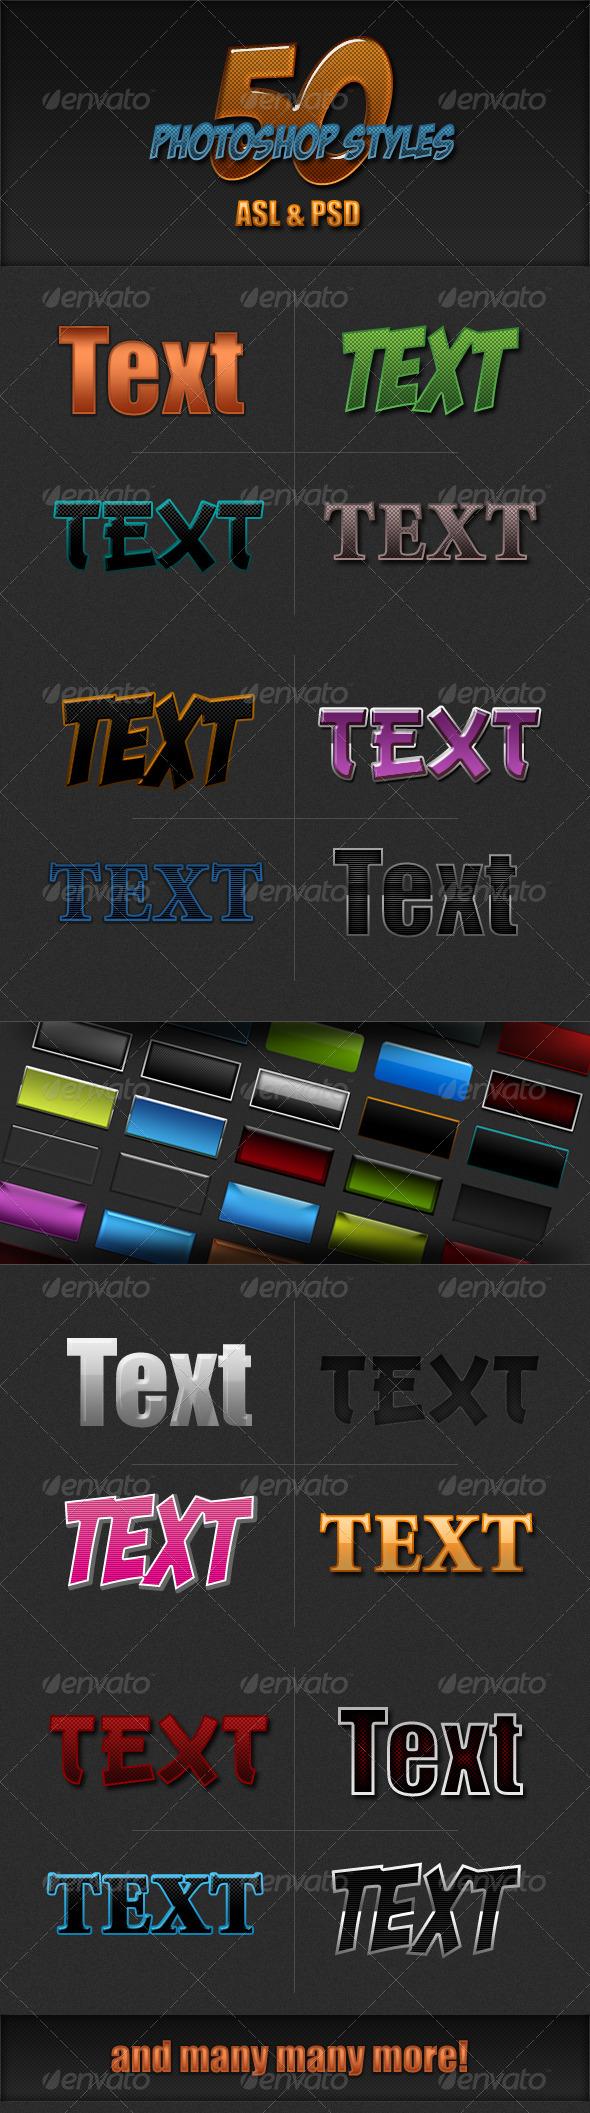 GraphicRiver 50 Photoshop Styles Set 7933006